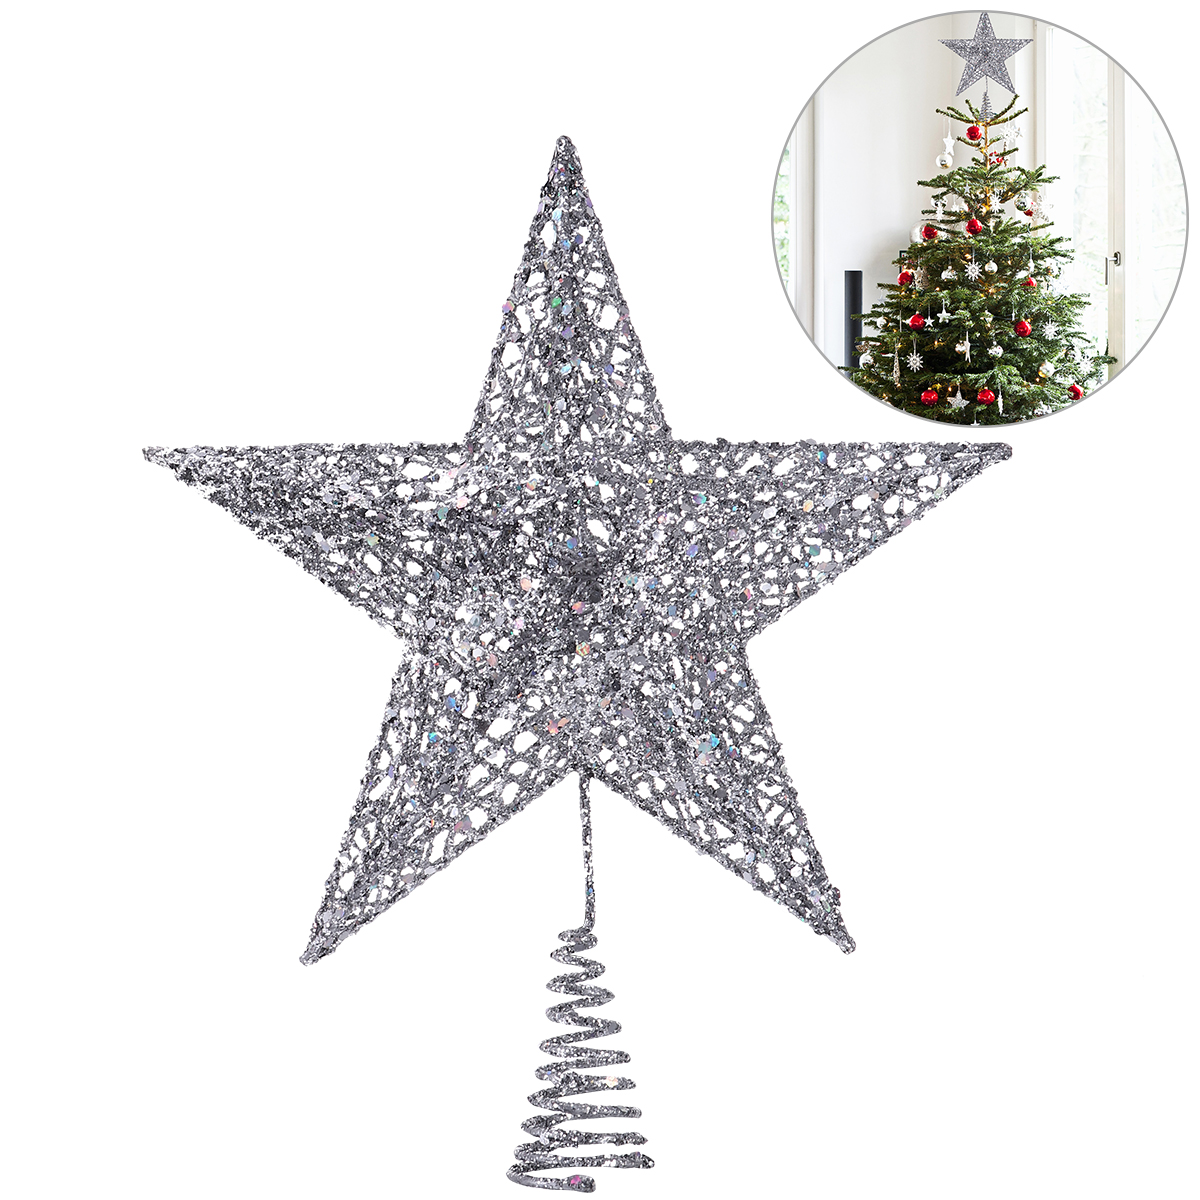 NICEXMAS Christmas Tree Light LED Star Tree Topper Treetop Decoration Gold Light